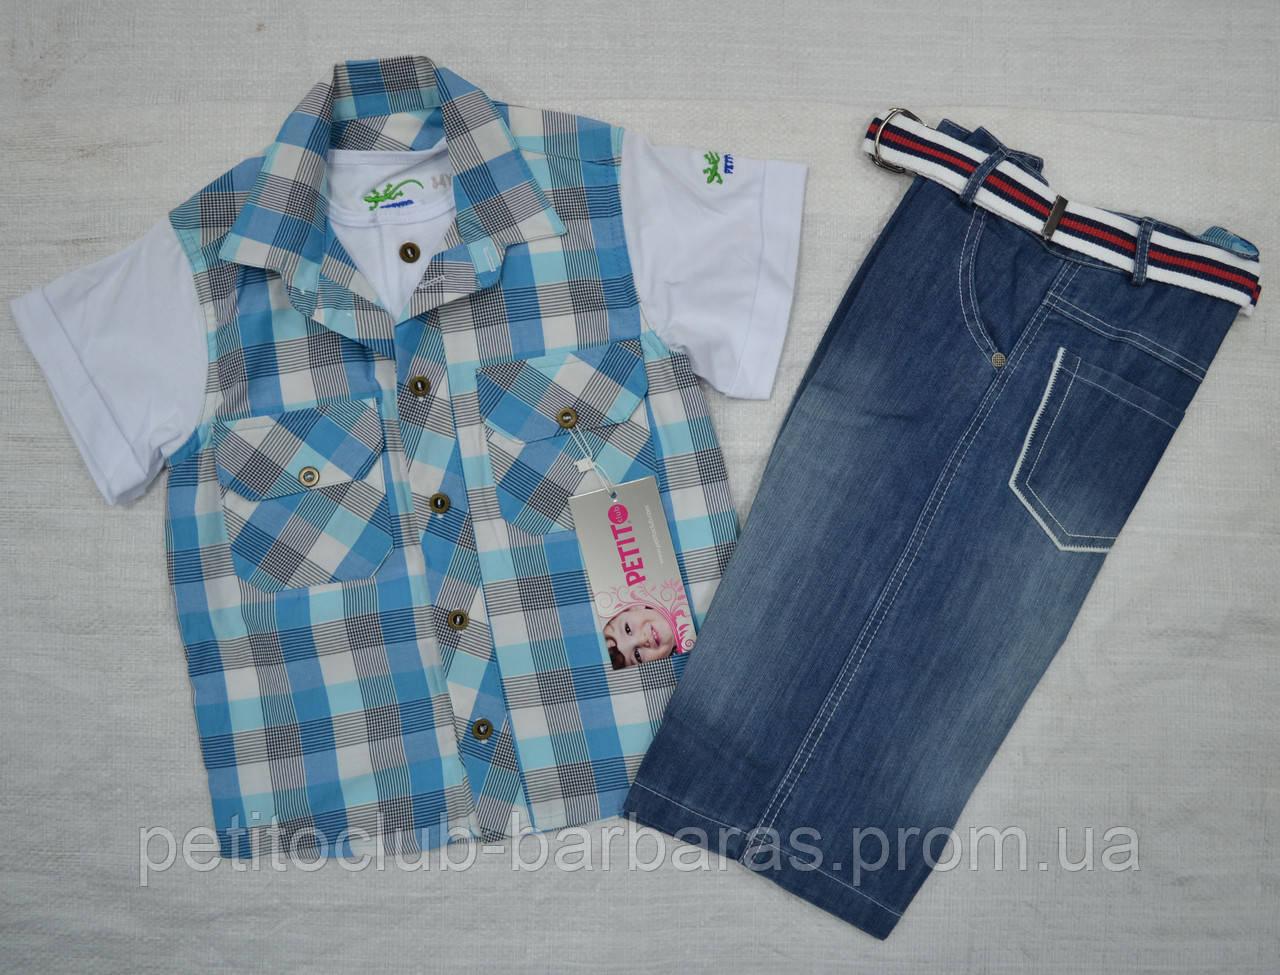 Летний комплект для мальчика футболка-рубашка и шорты (Petito Club, Турция)